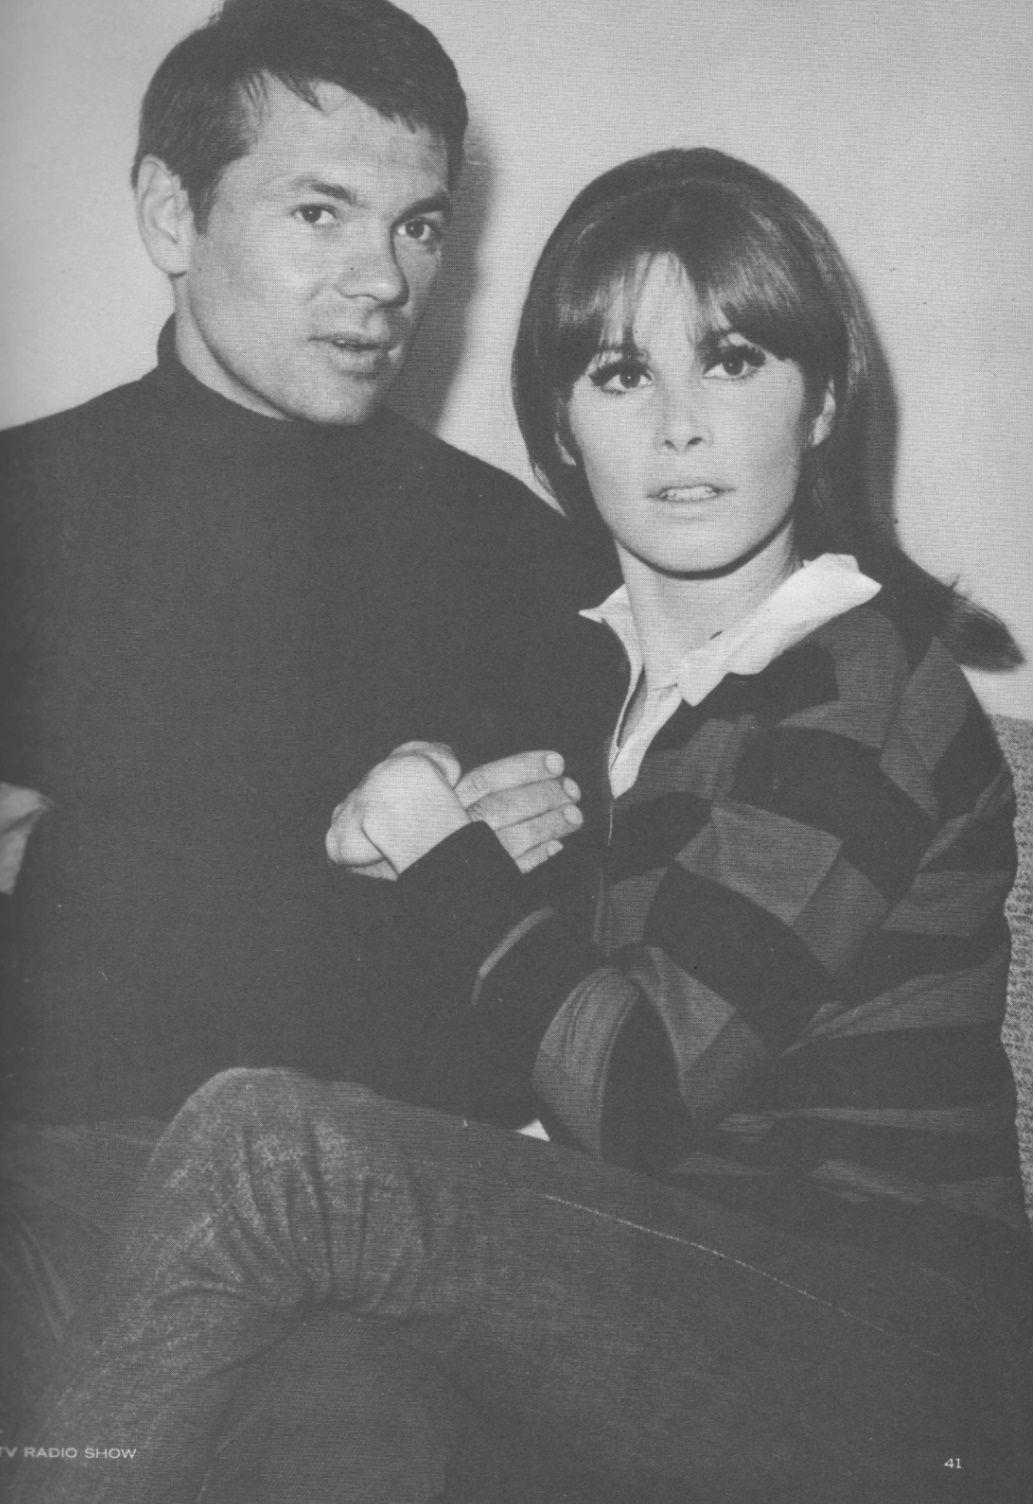 B&W photo of Stefanie Powers and her husband Garry Lockwood